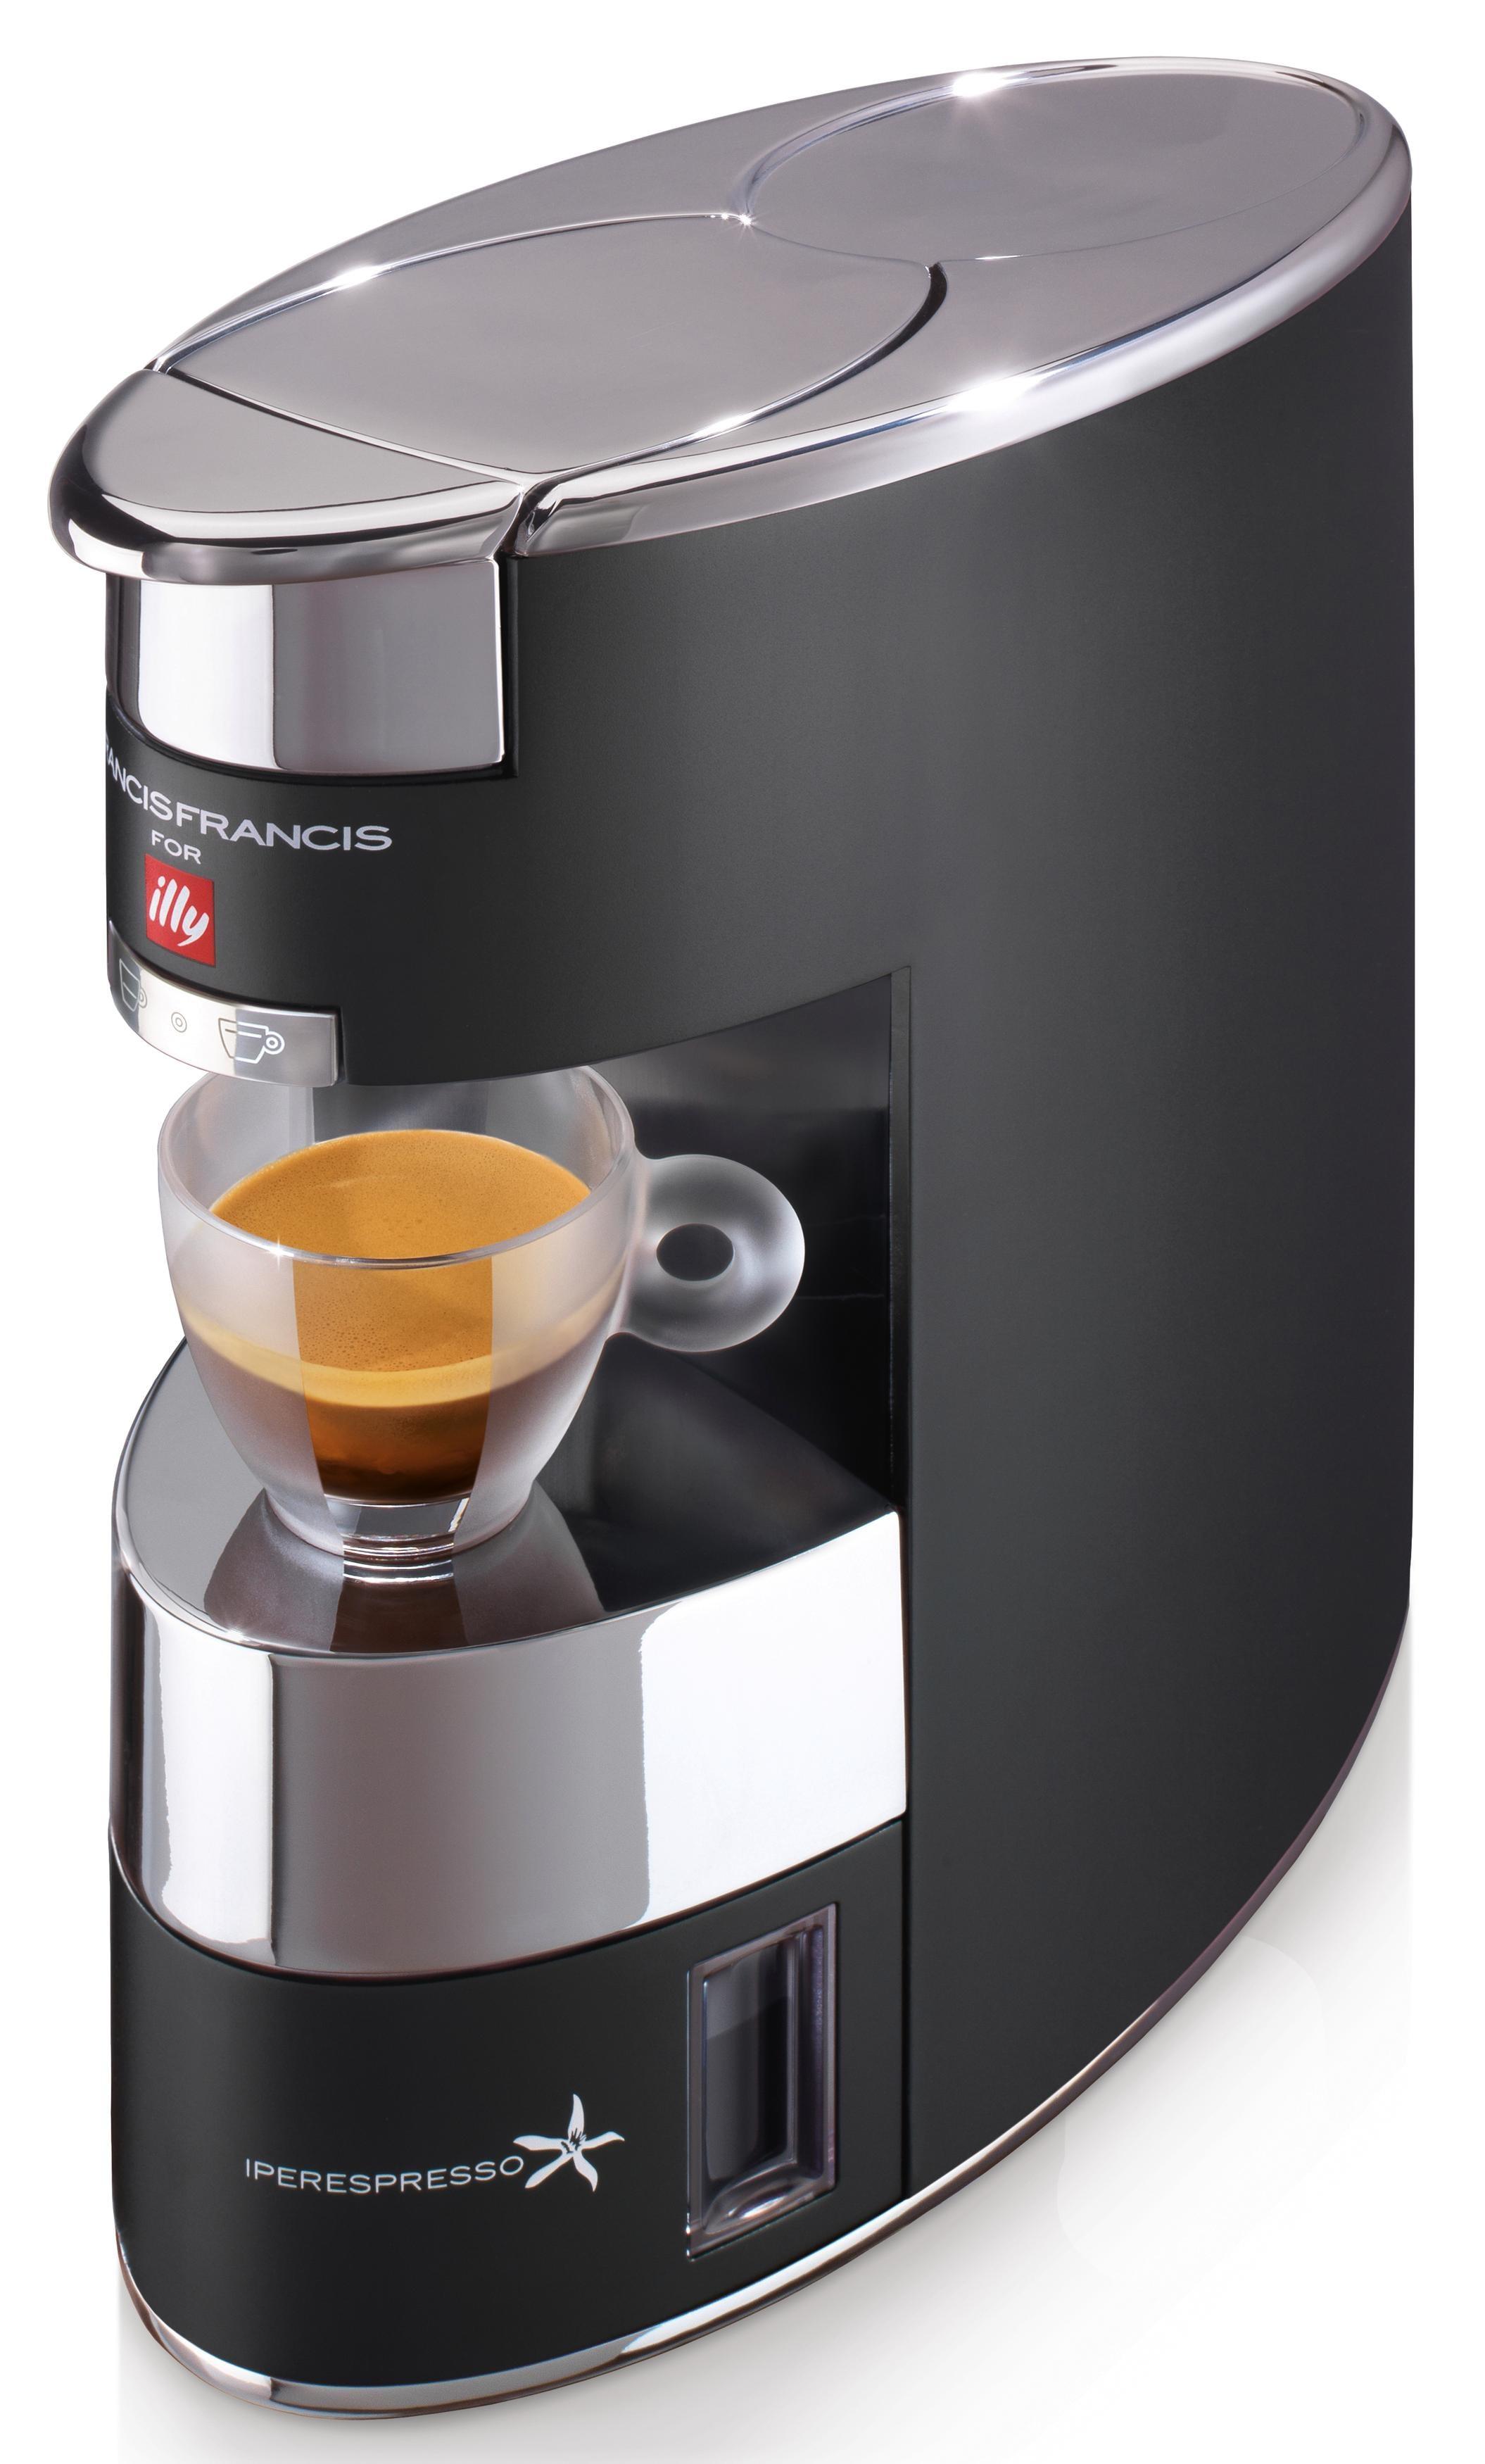 Illy Kapselmaschine FrancisFrancis X9 Iperespresso, schwarz Kaffee Espresso SOFORT LIEFERBARE Haushaltsgeräte